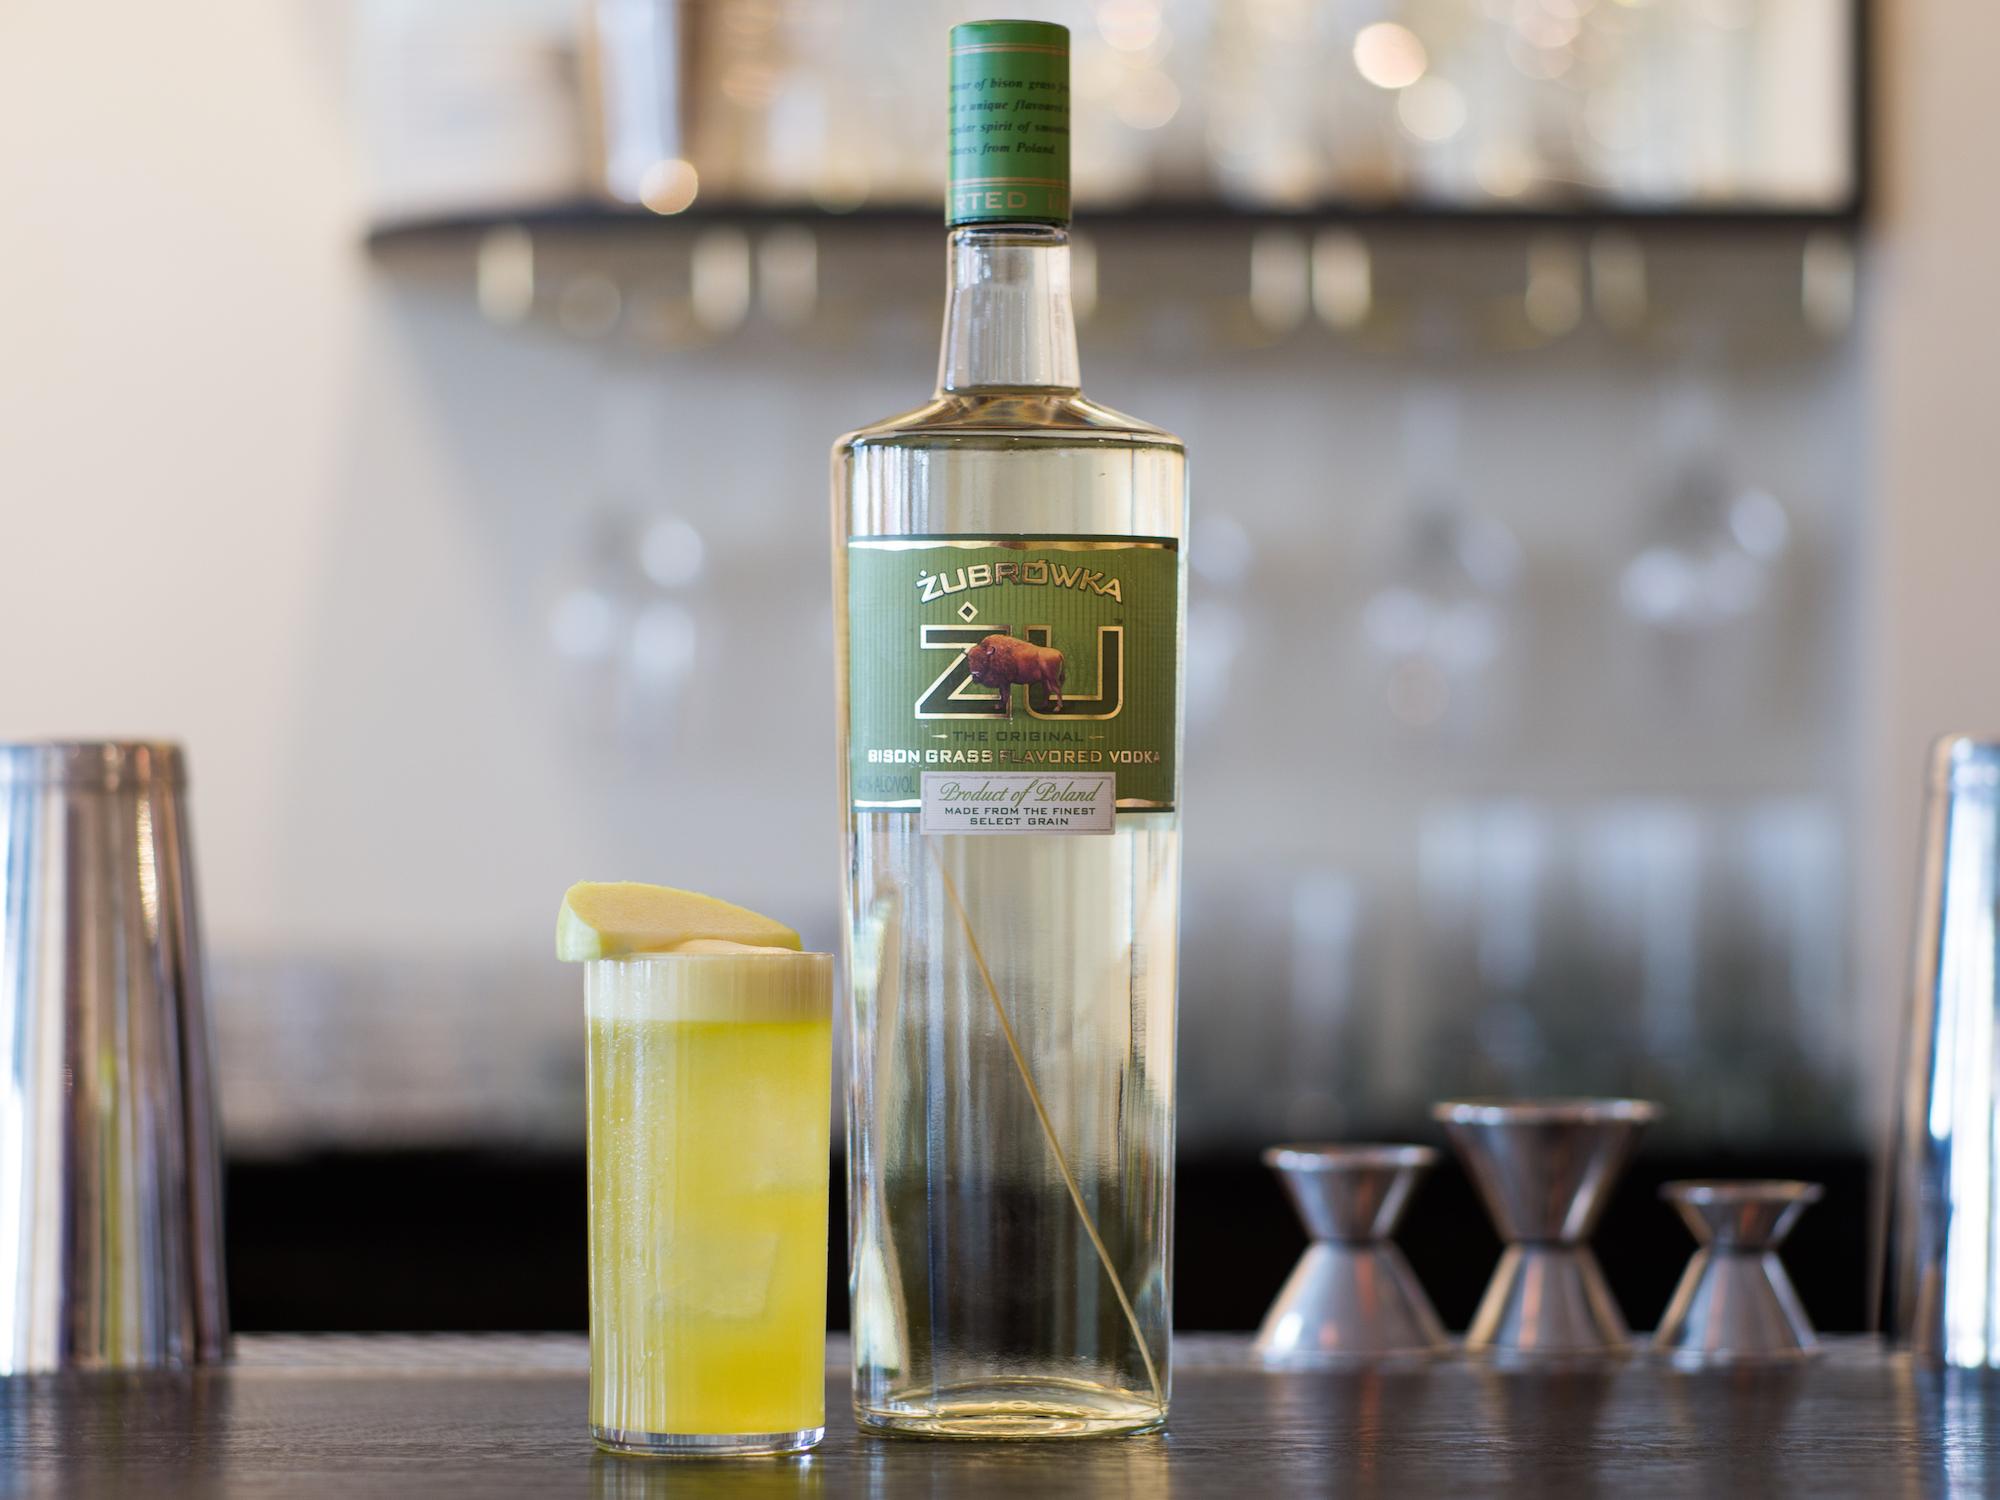 The Tatanka cocktail using Żubrówka vodka at Dante in New York's West Village.